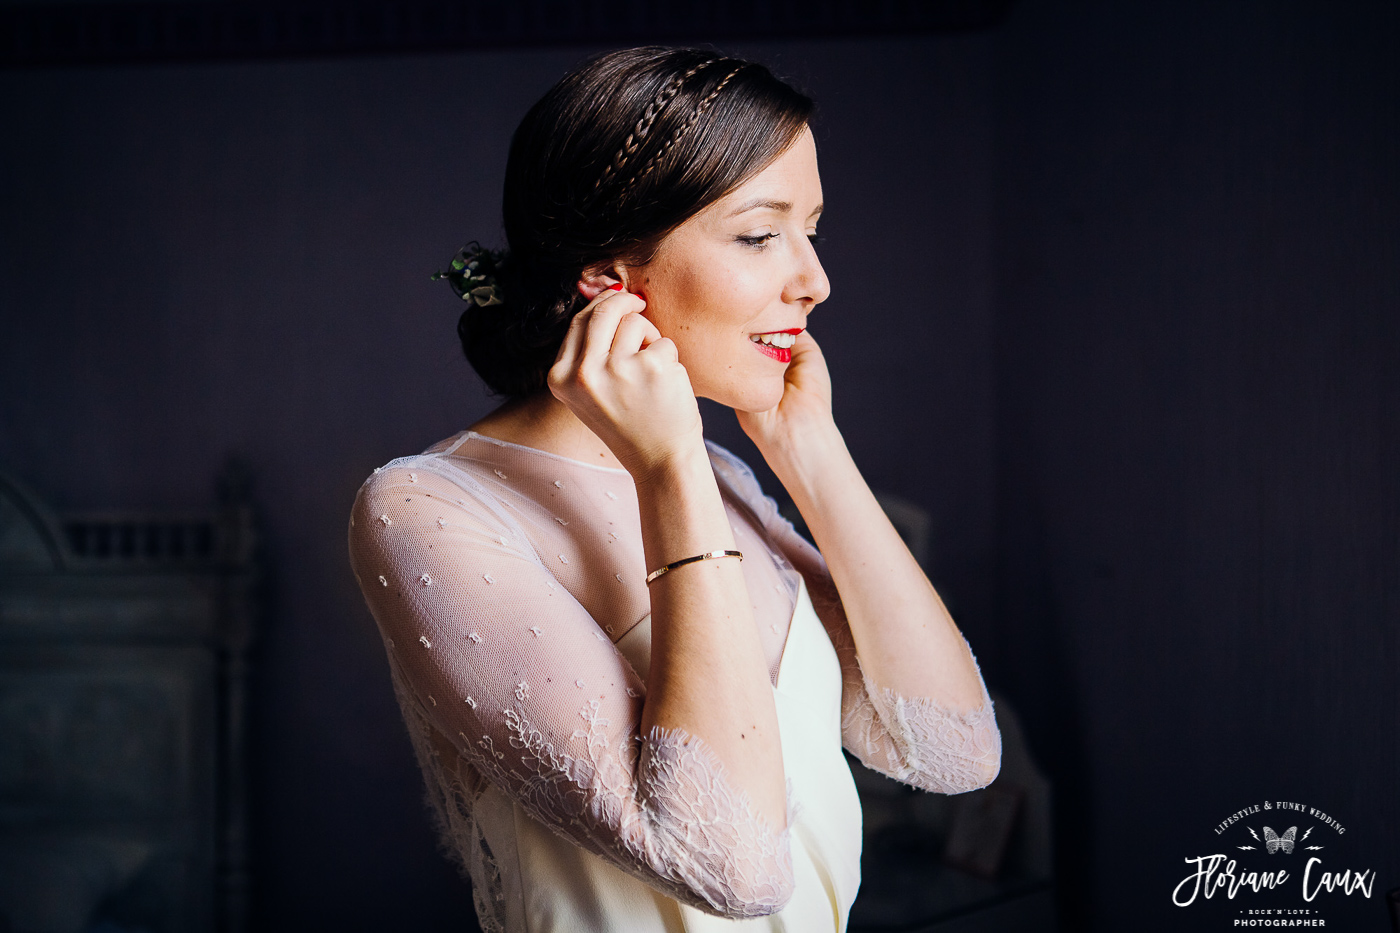 photographe-mariage-pays-basque-Floriane-Caux (13)